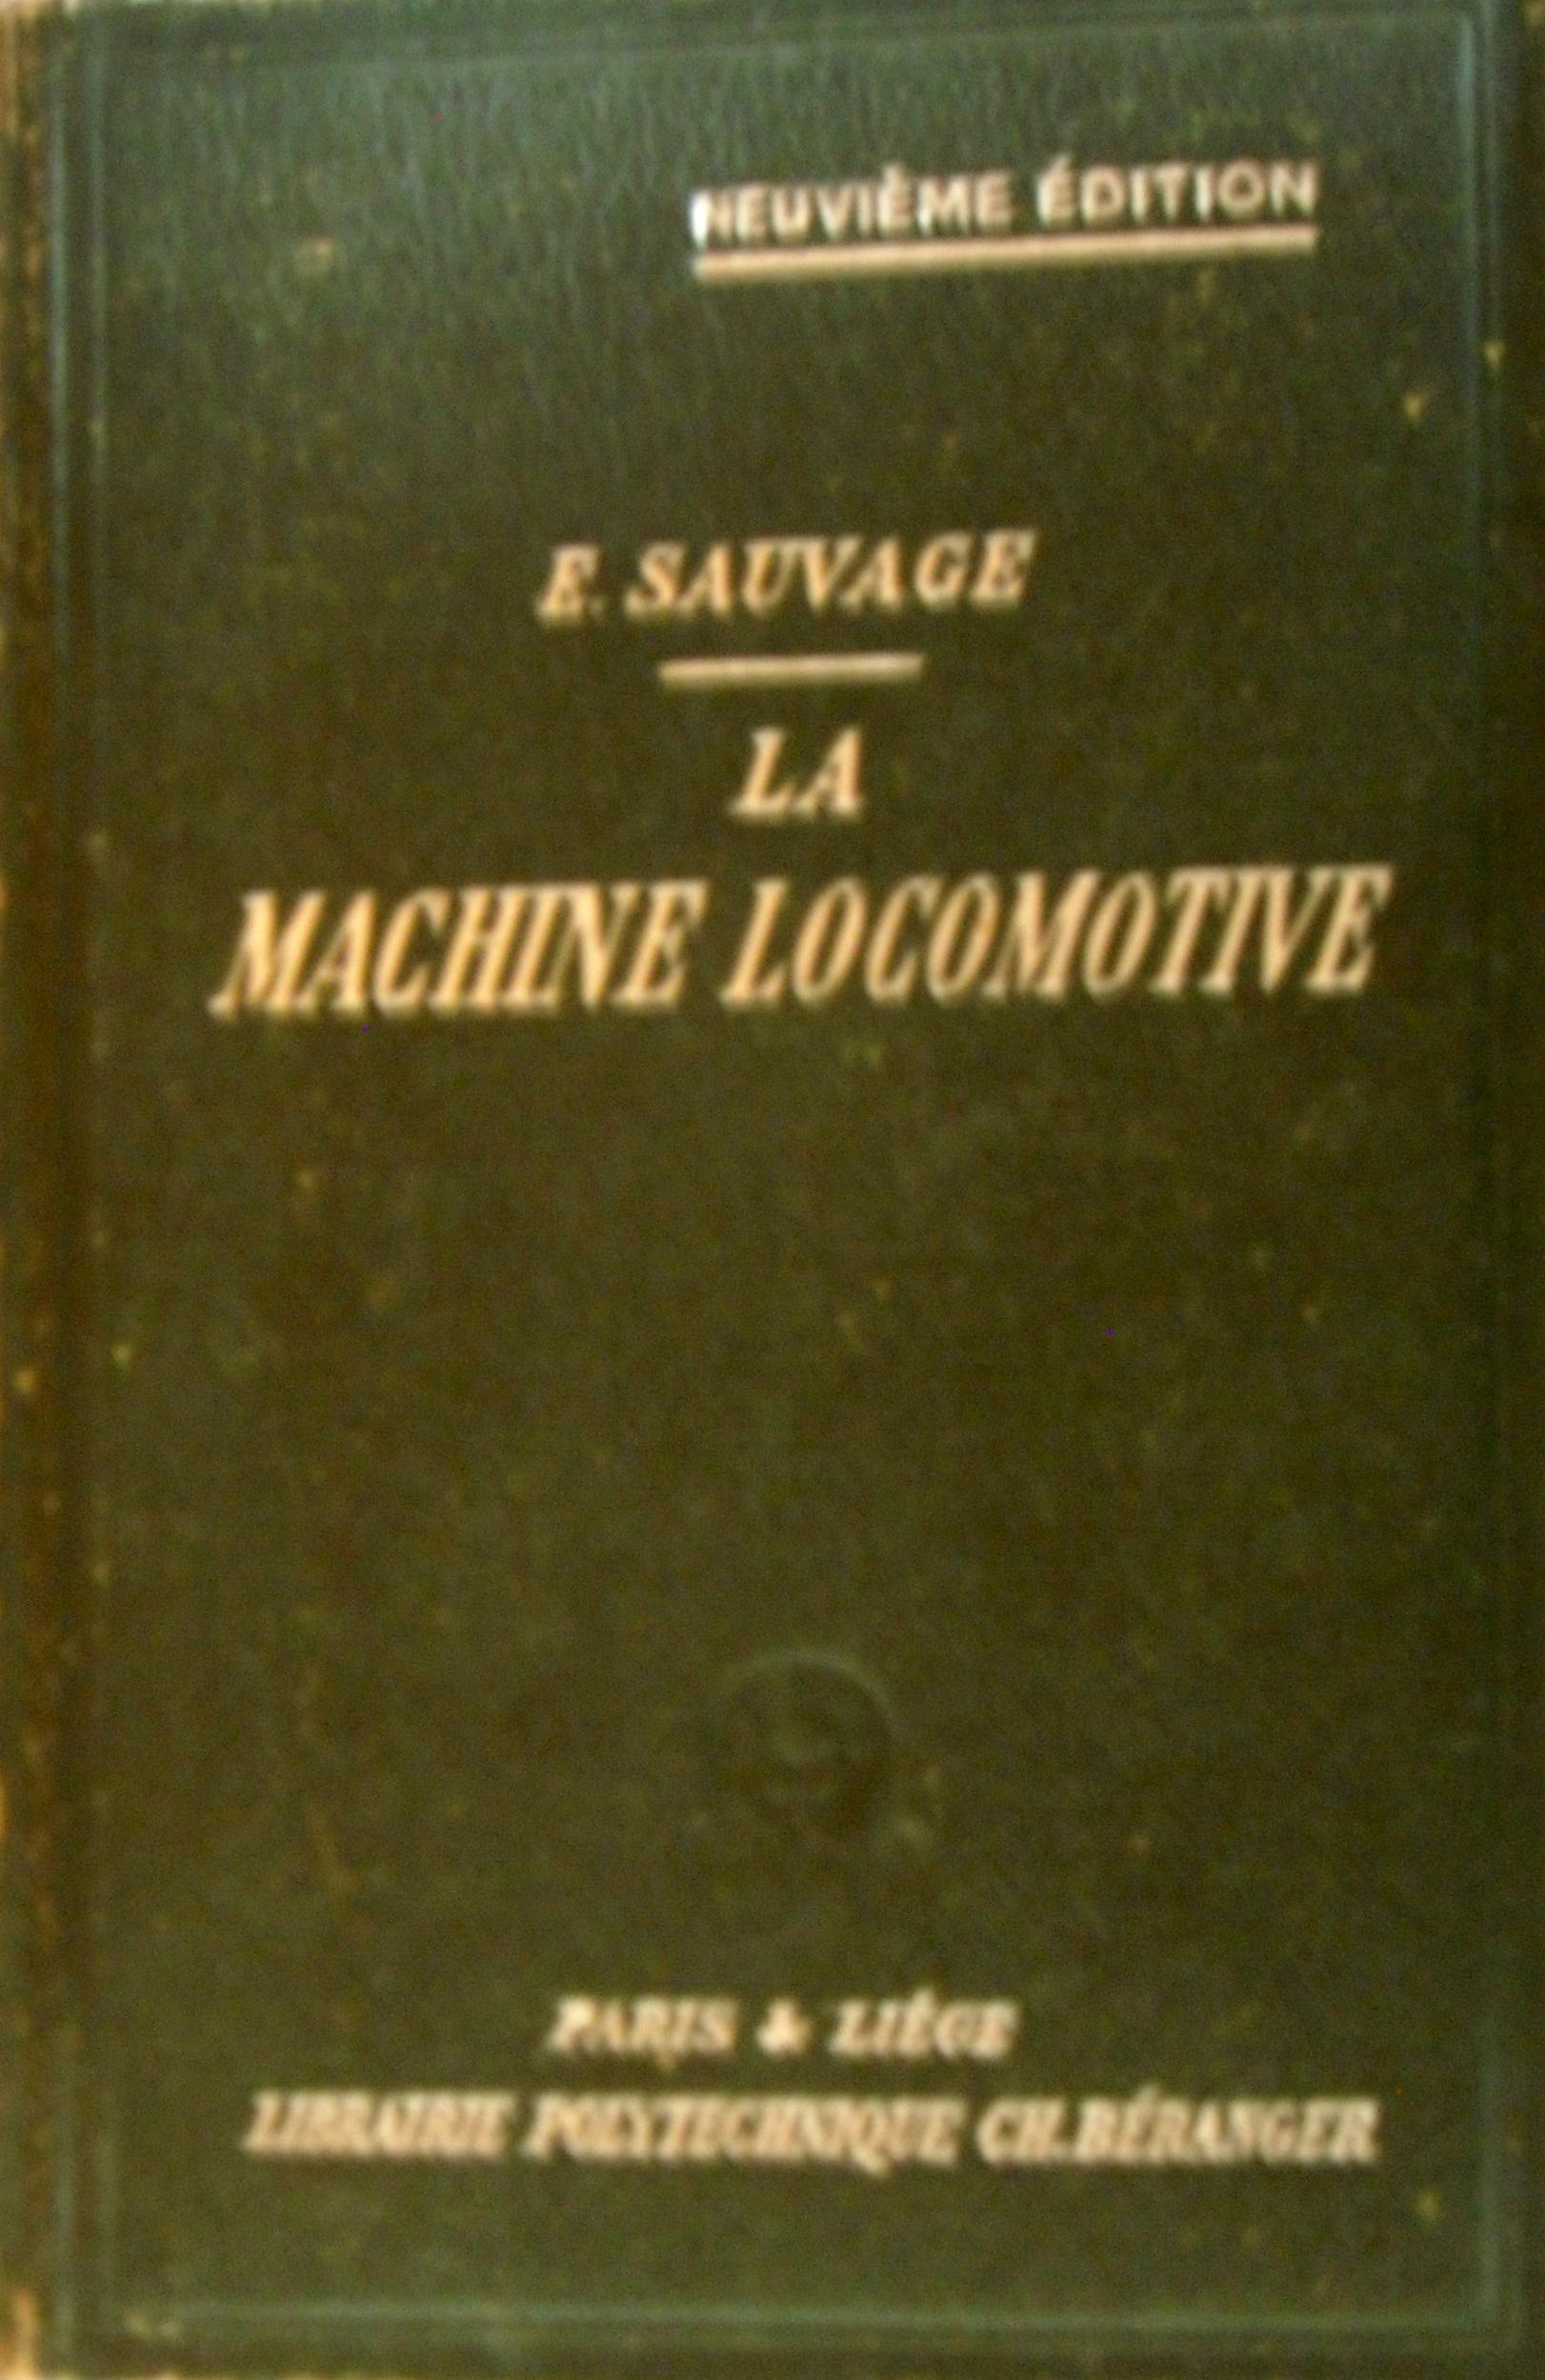 sauvage_locomotive_vapeur_couverture.JPG